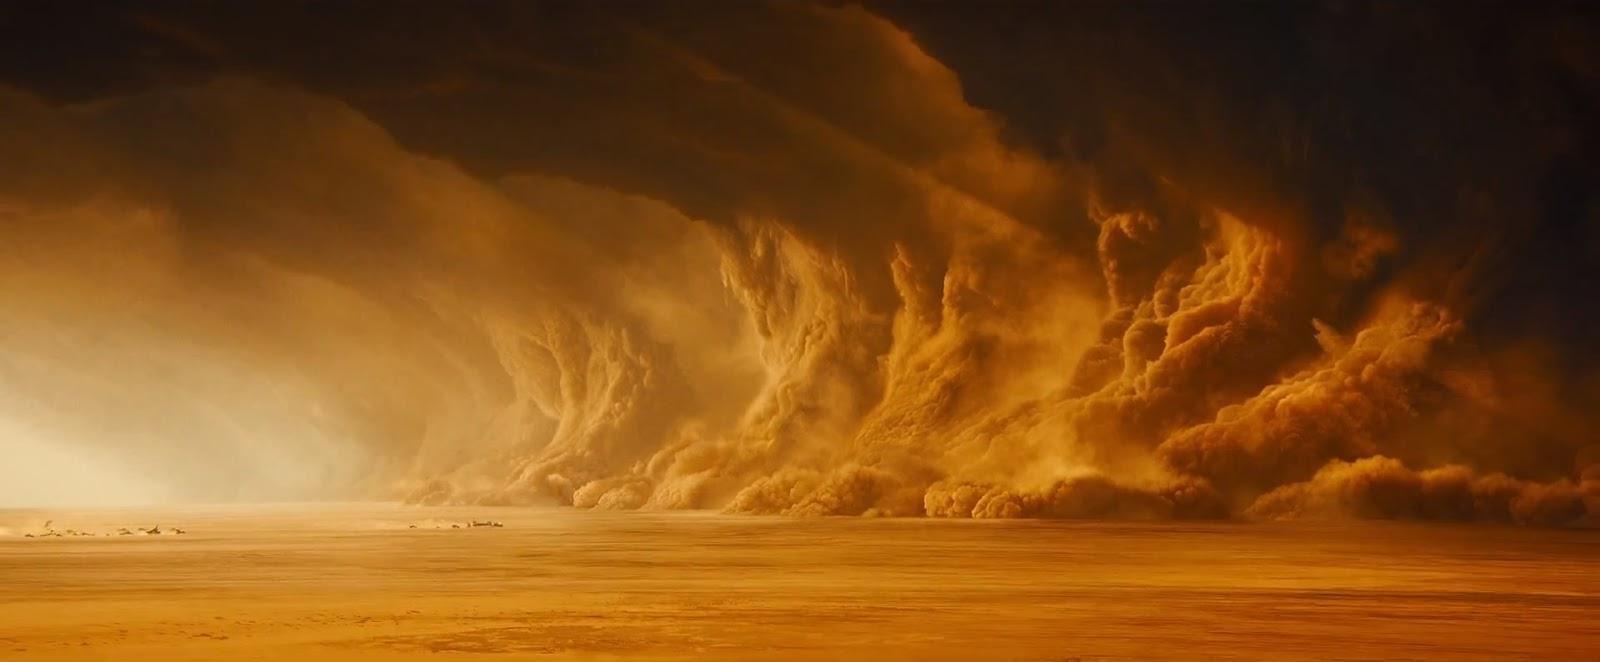 [Obrazek: 76ab5-fury-road-the-storm2b252822529.jpg]